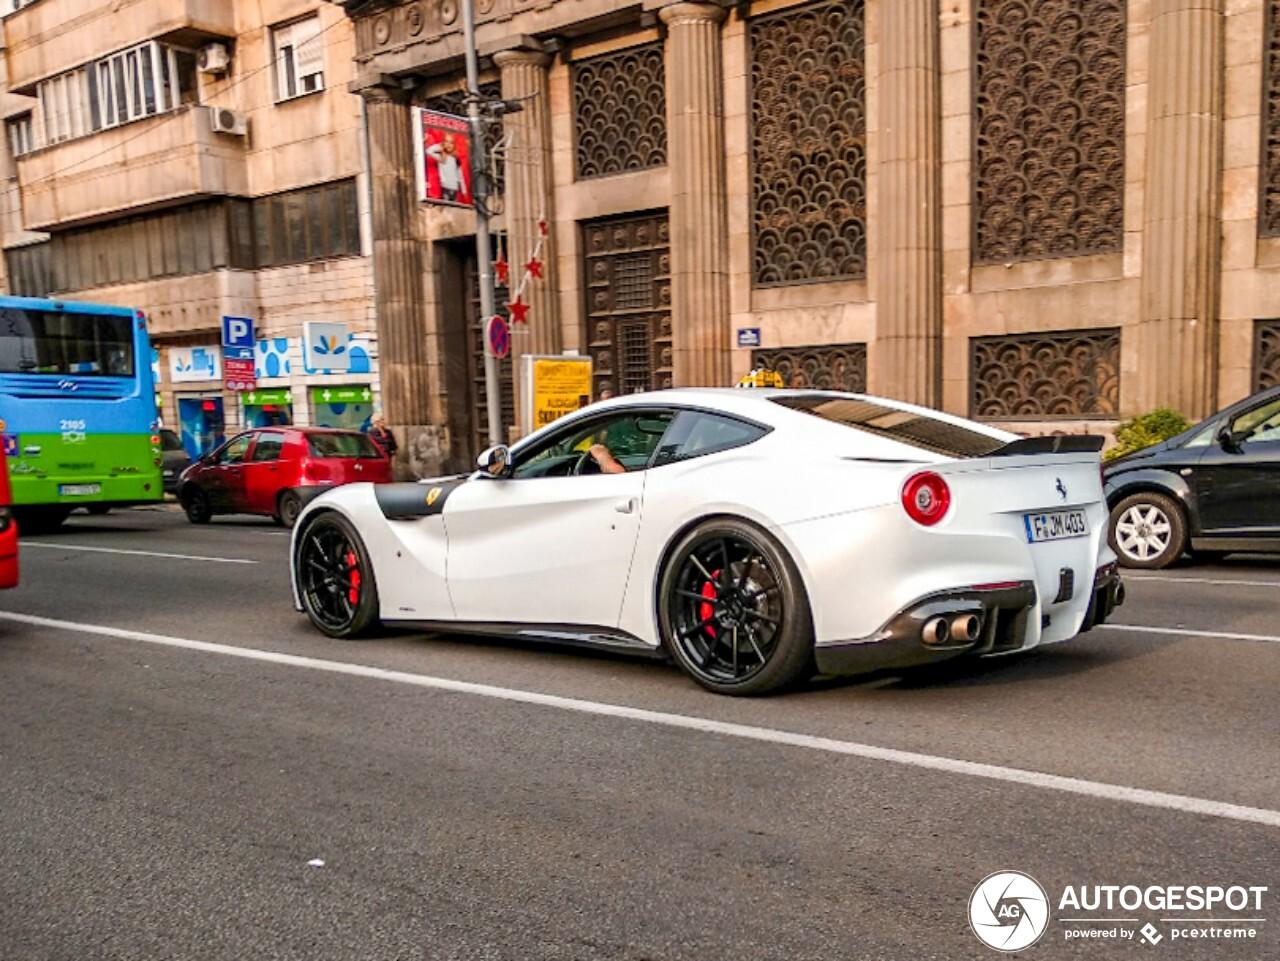 Ferrari F12berlinetta RevoZport